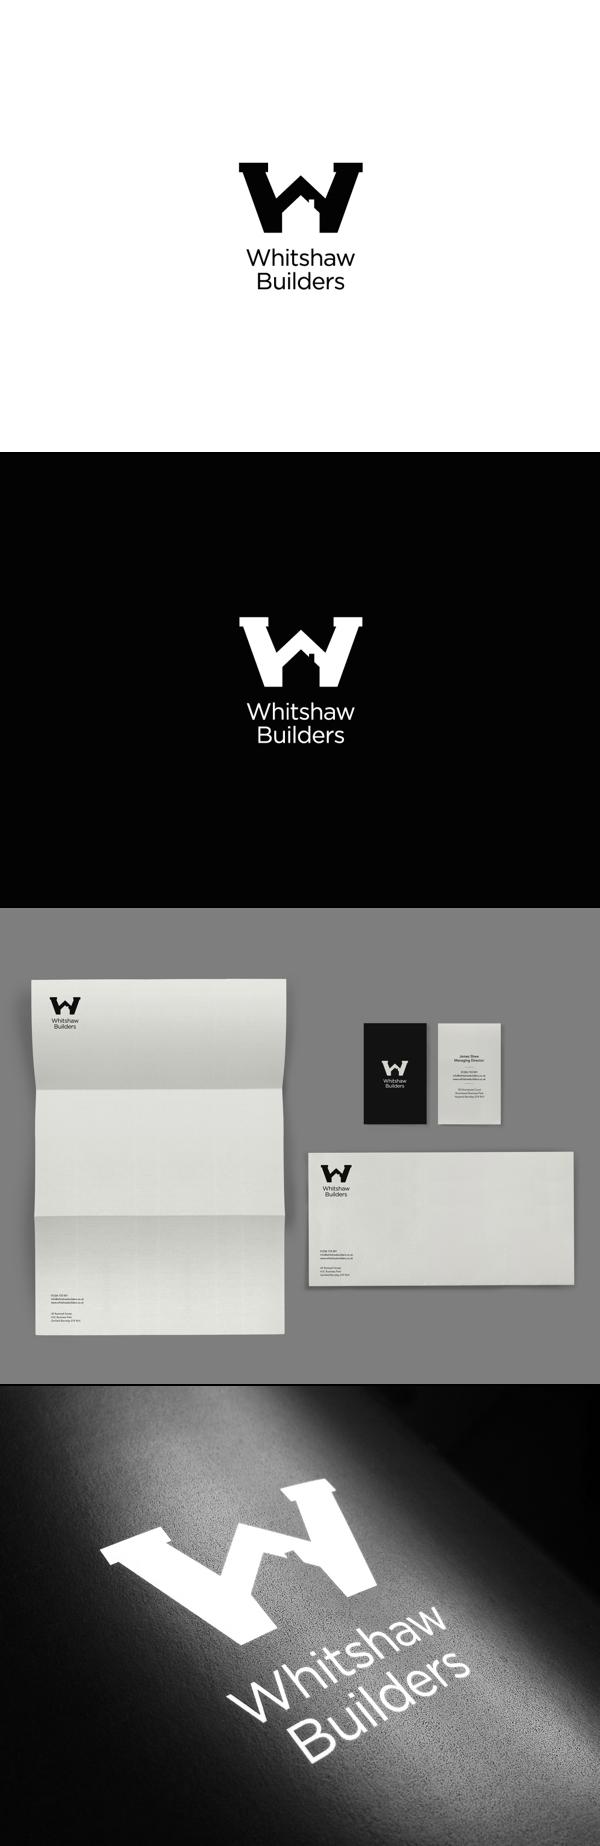 Whitshaw Builders Brand Identity via Behance. | design ...